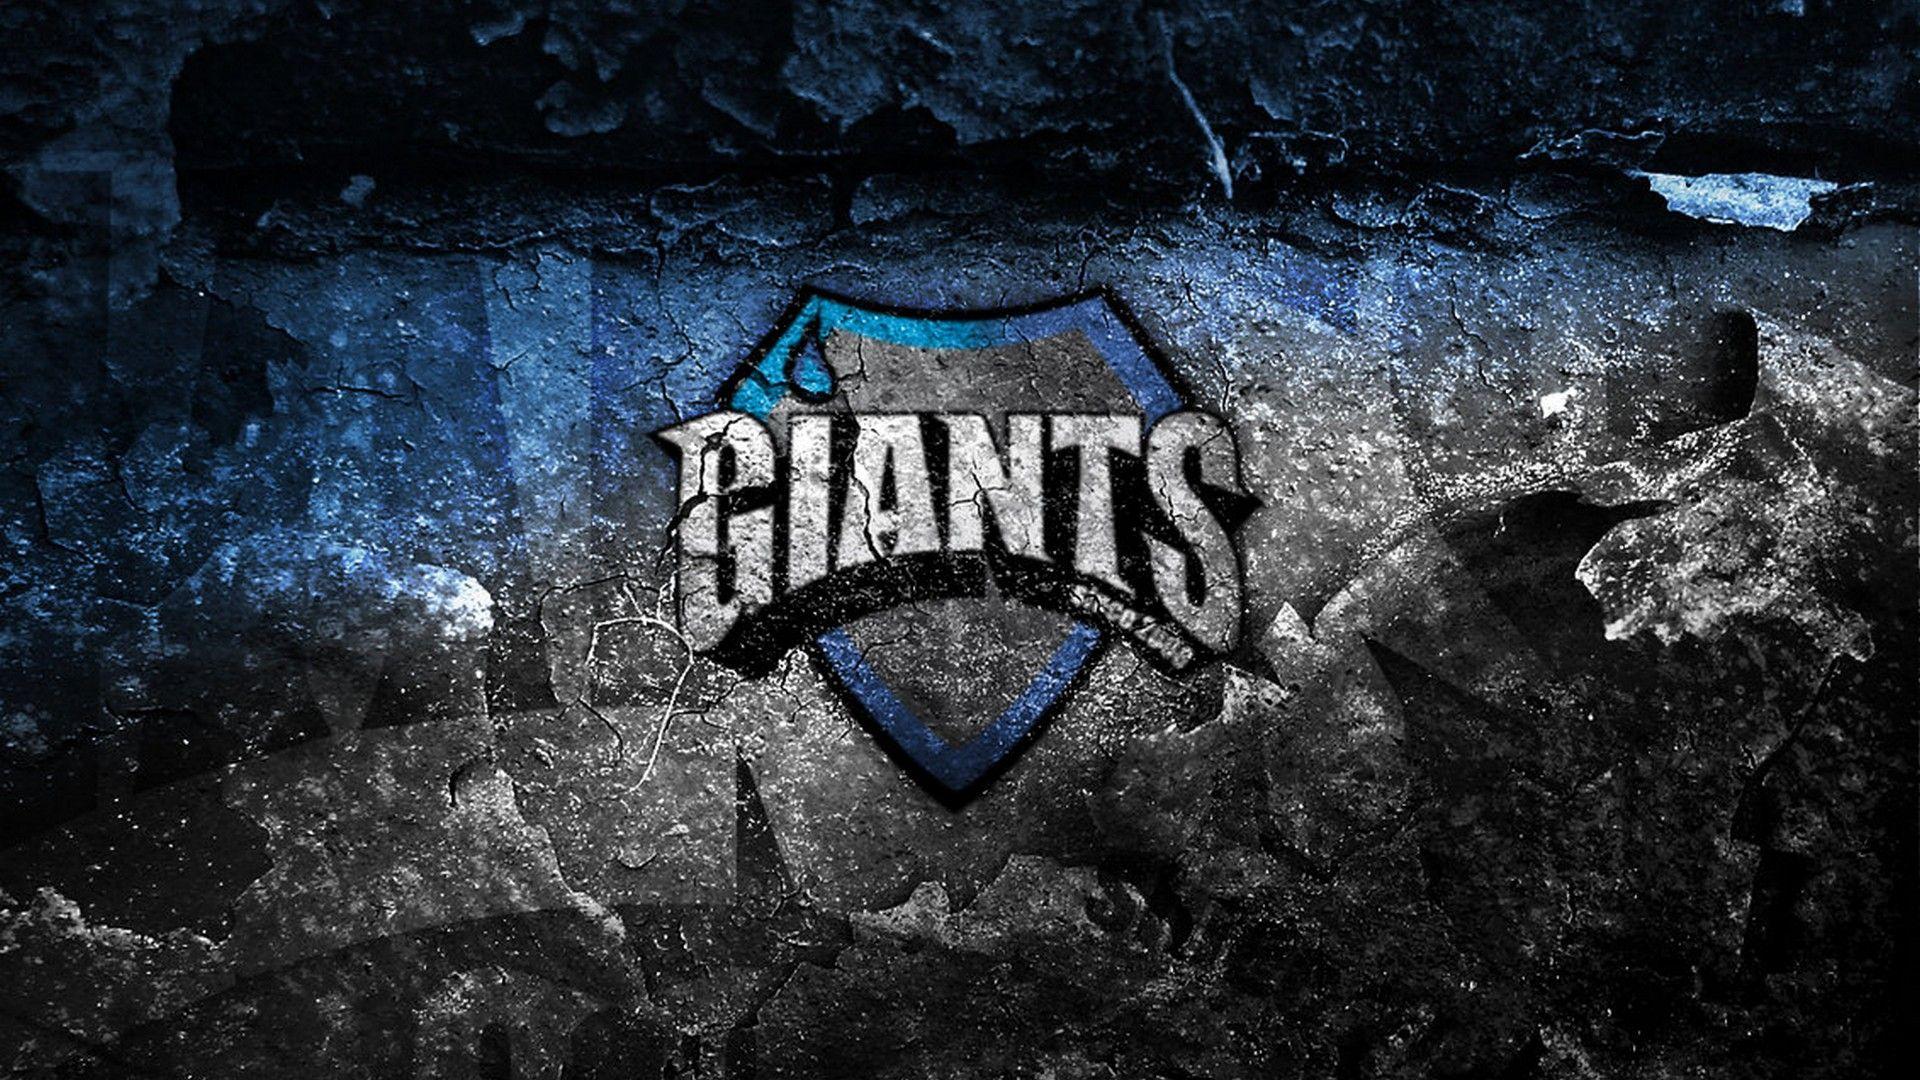 HD New York Giants Backgrounds Nfl football wallpaper